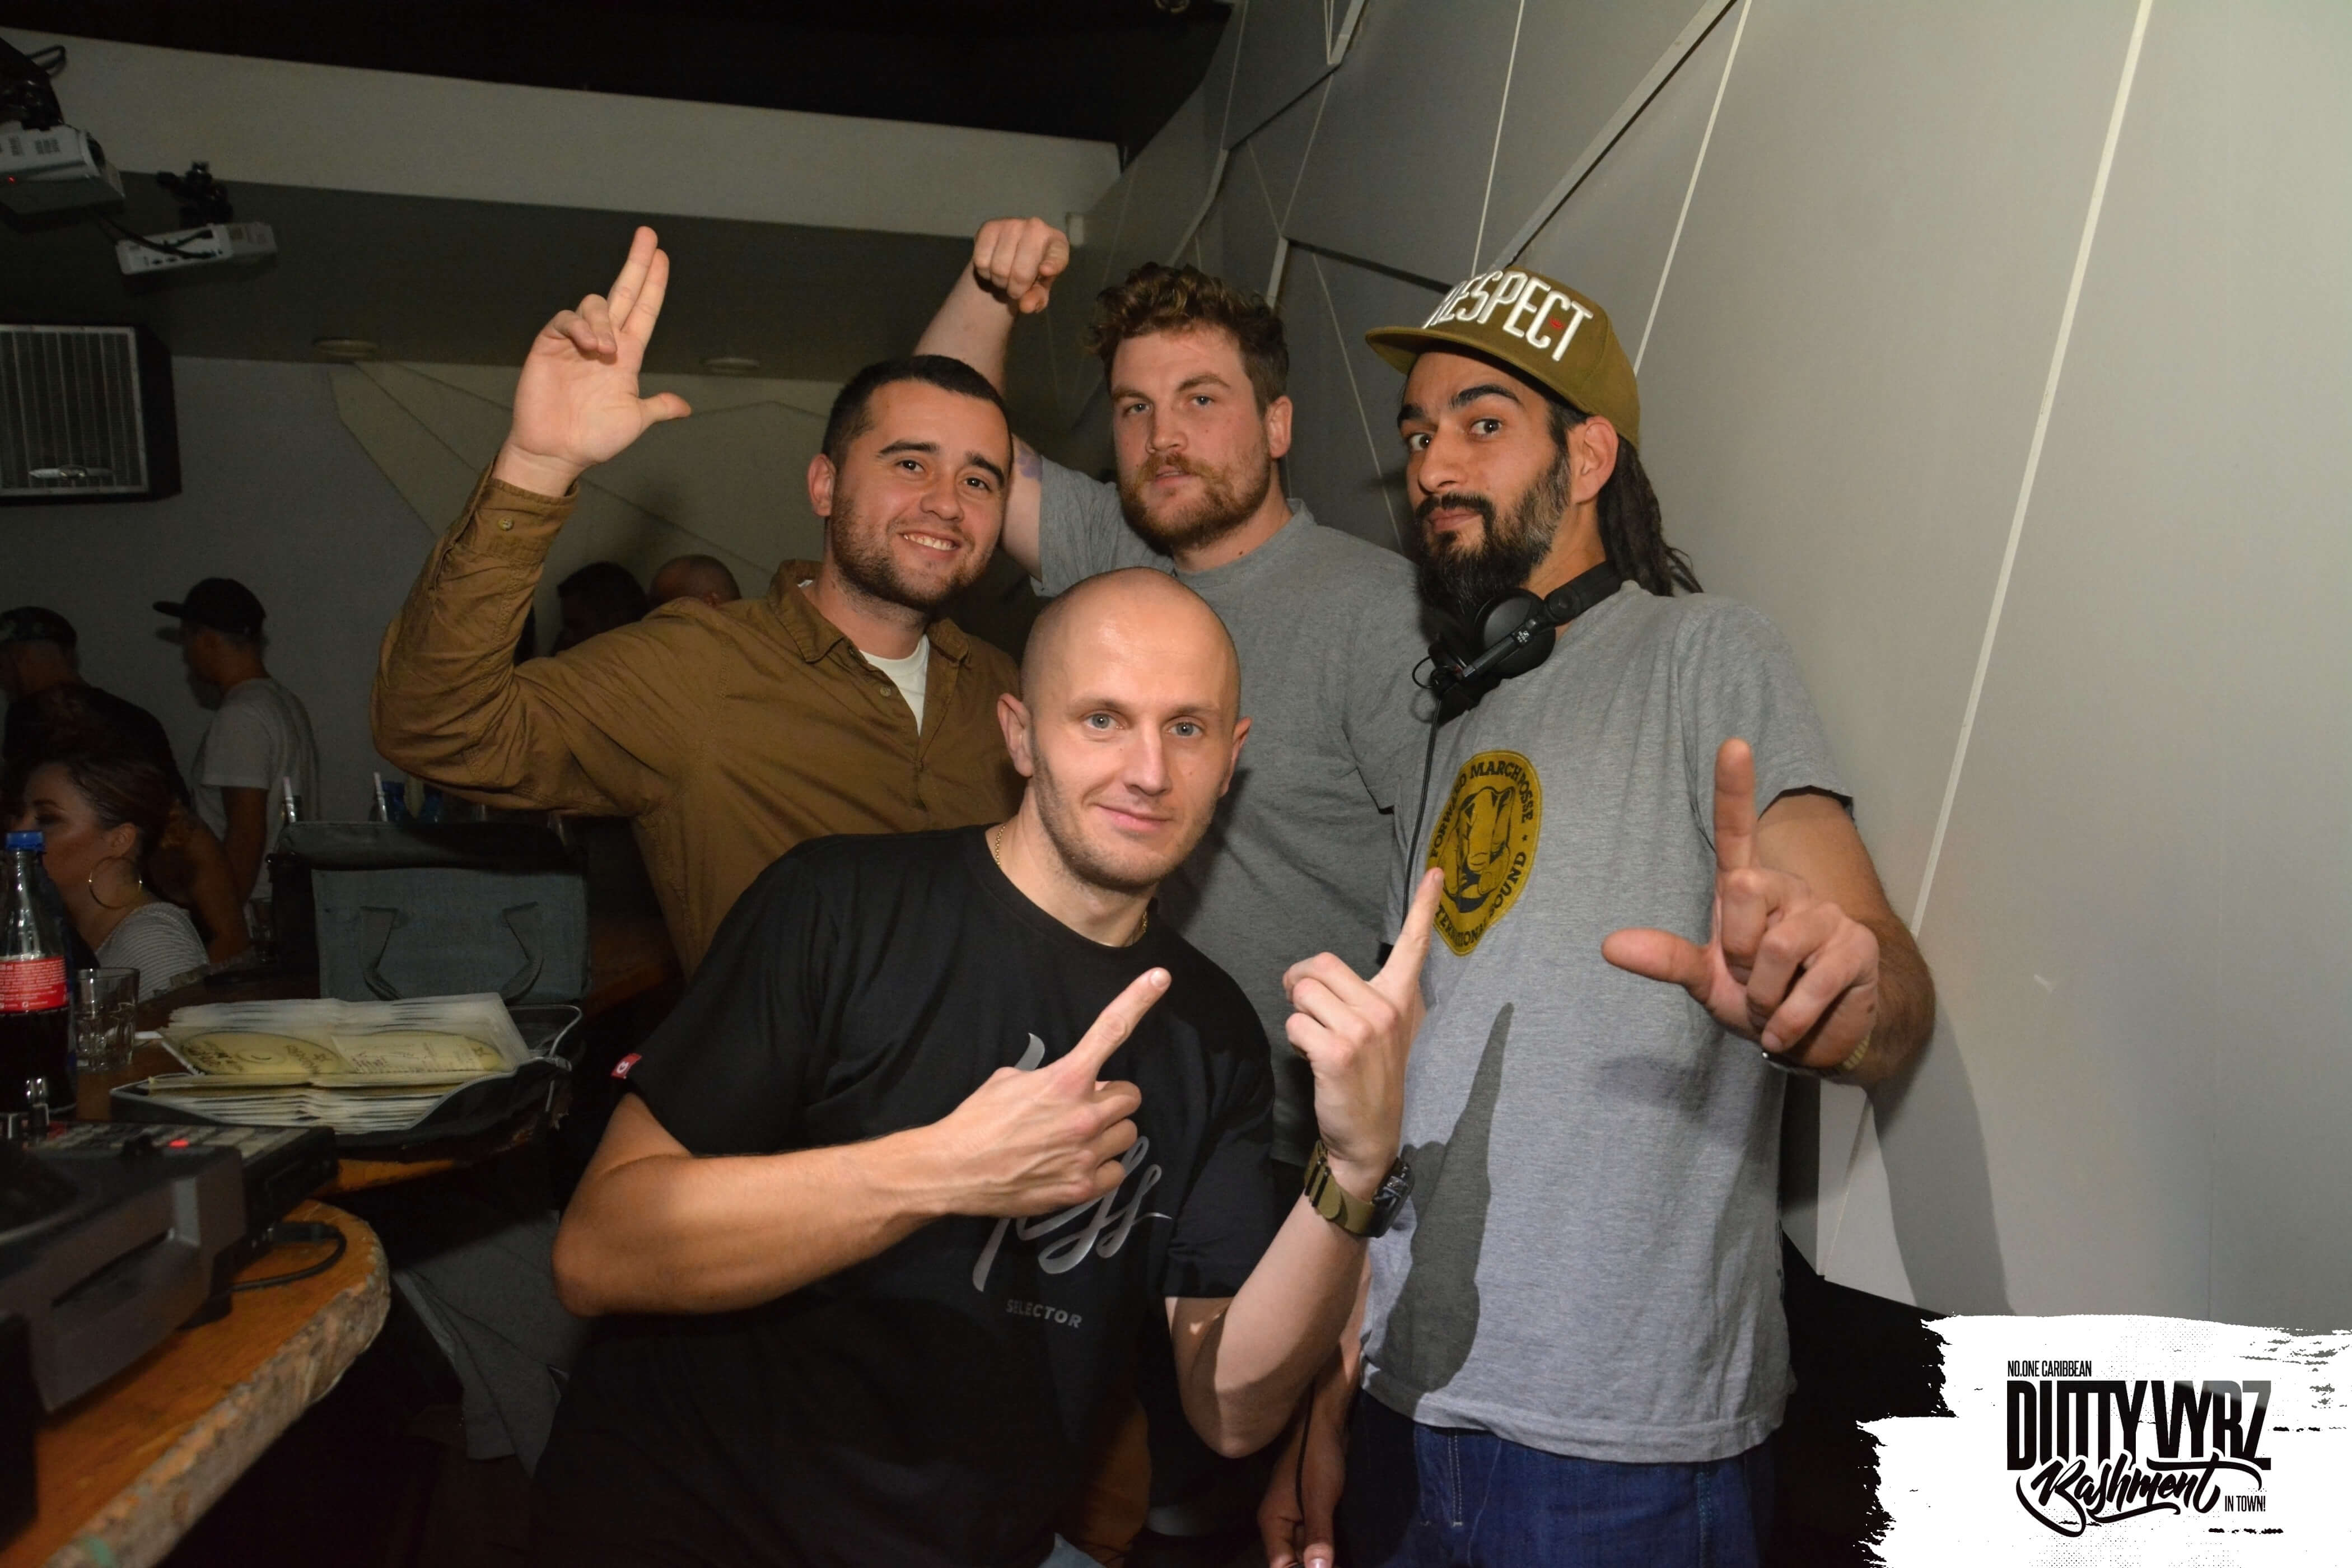 26-11-2016-dutty-vybz-party-dj-messs-b-day-bashment-10 - DJ MESS